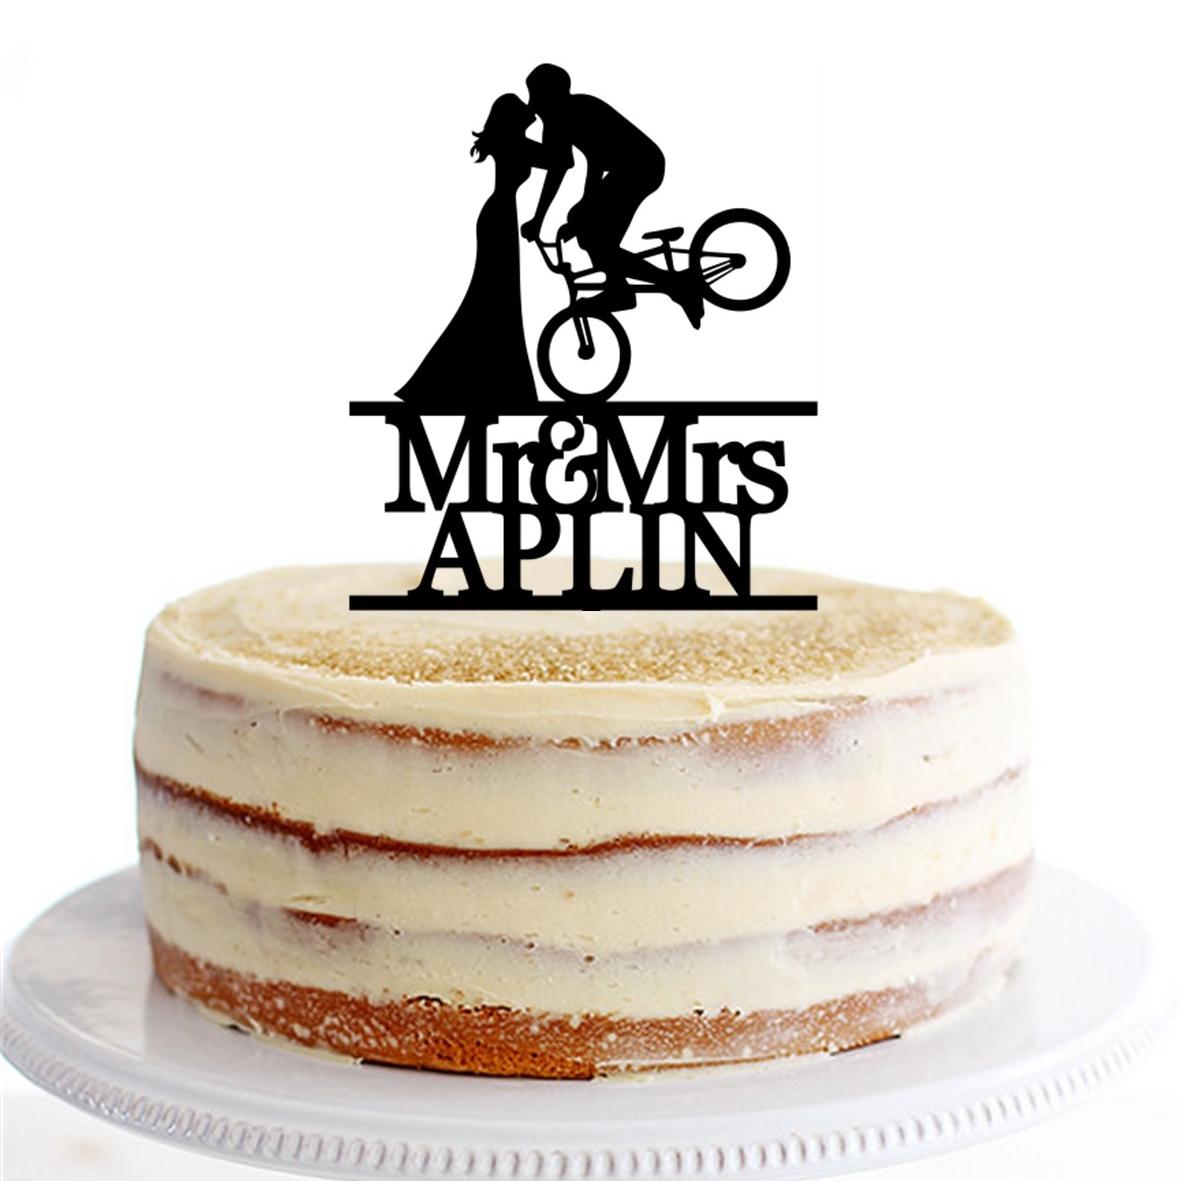 BMX Bike Bride & Groom Mr & Mrs Name Cake Topper